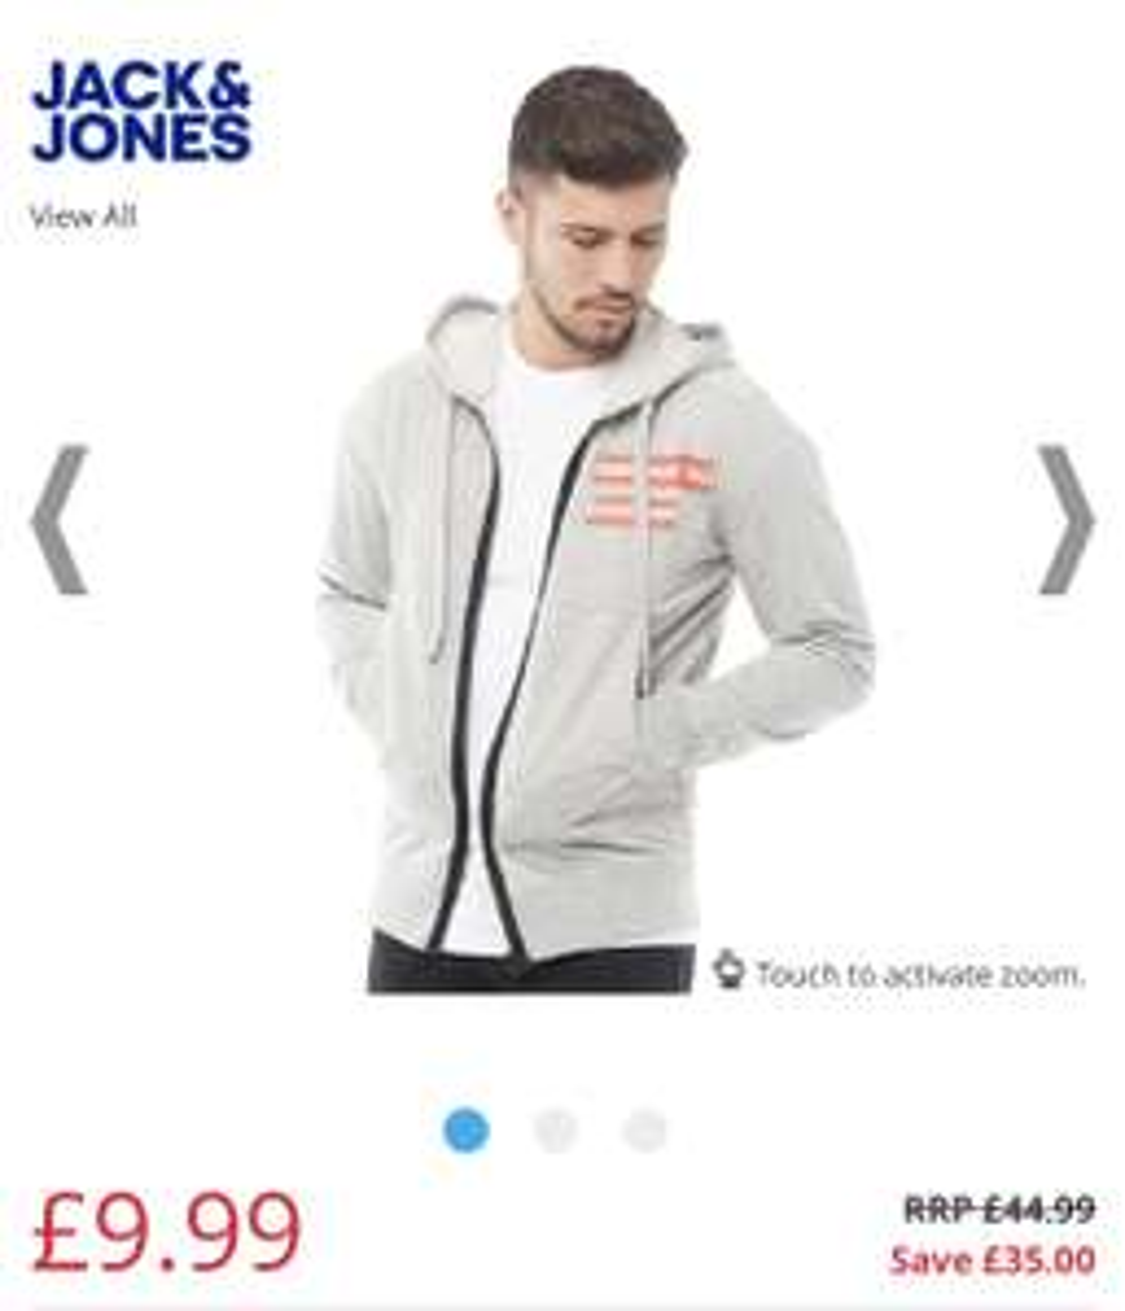 JACK AND JONES Mens Core Clone Sweat Hoody Light Grey MelangeColour: Pale Grey Marl/Red/White/Black - £9.99 @ MandM Direct (£4.99 P&P)